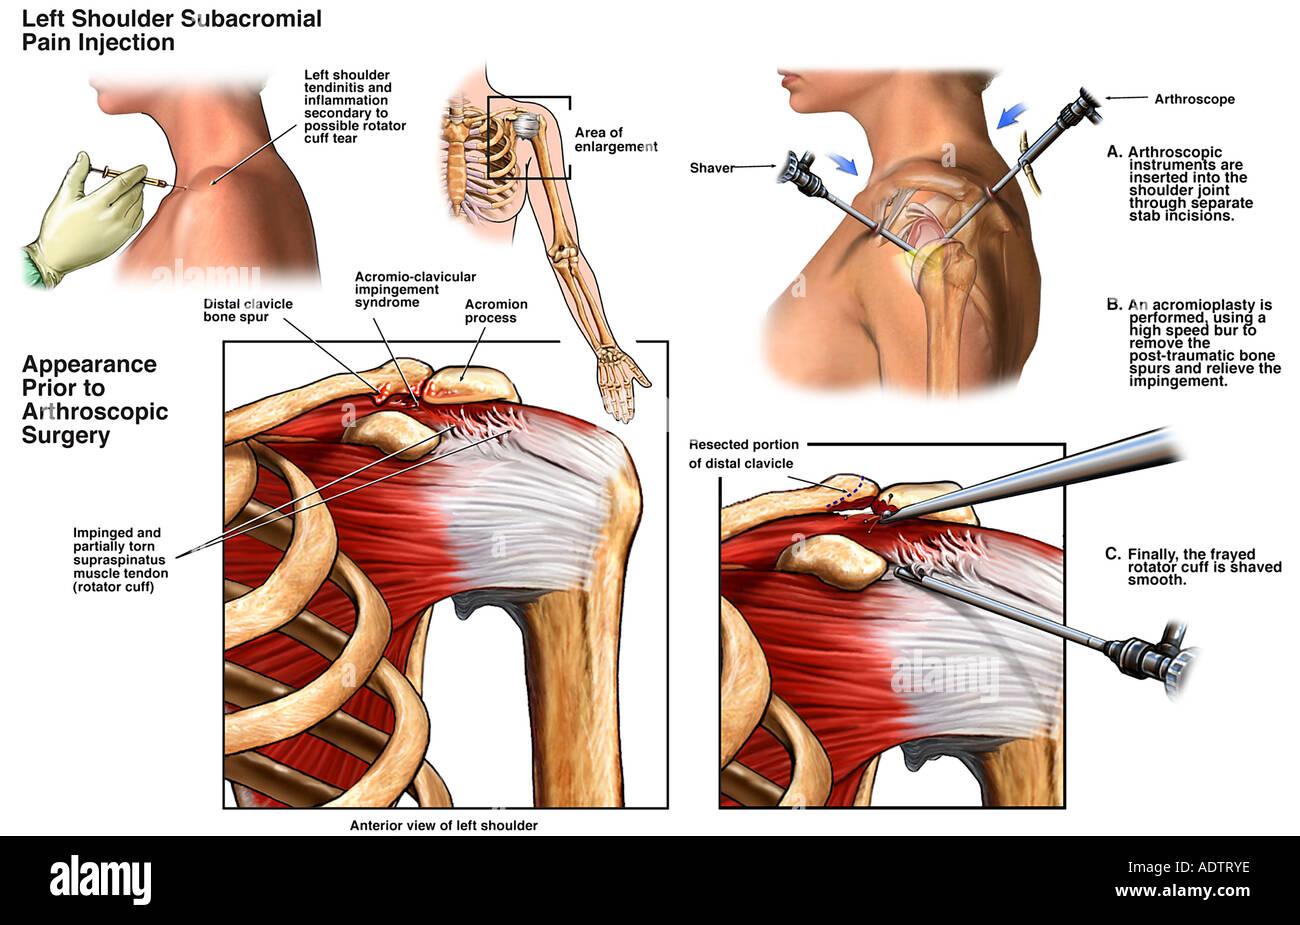 Left Shoulder Arthroscopic Subacromial Decompression Surgery Stock ...